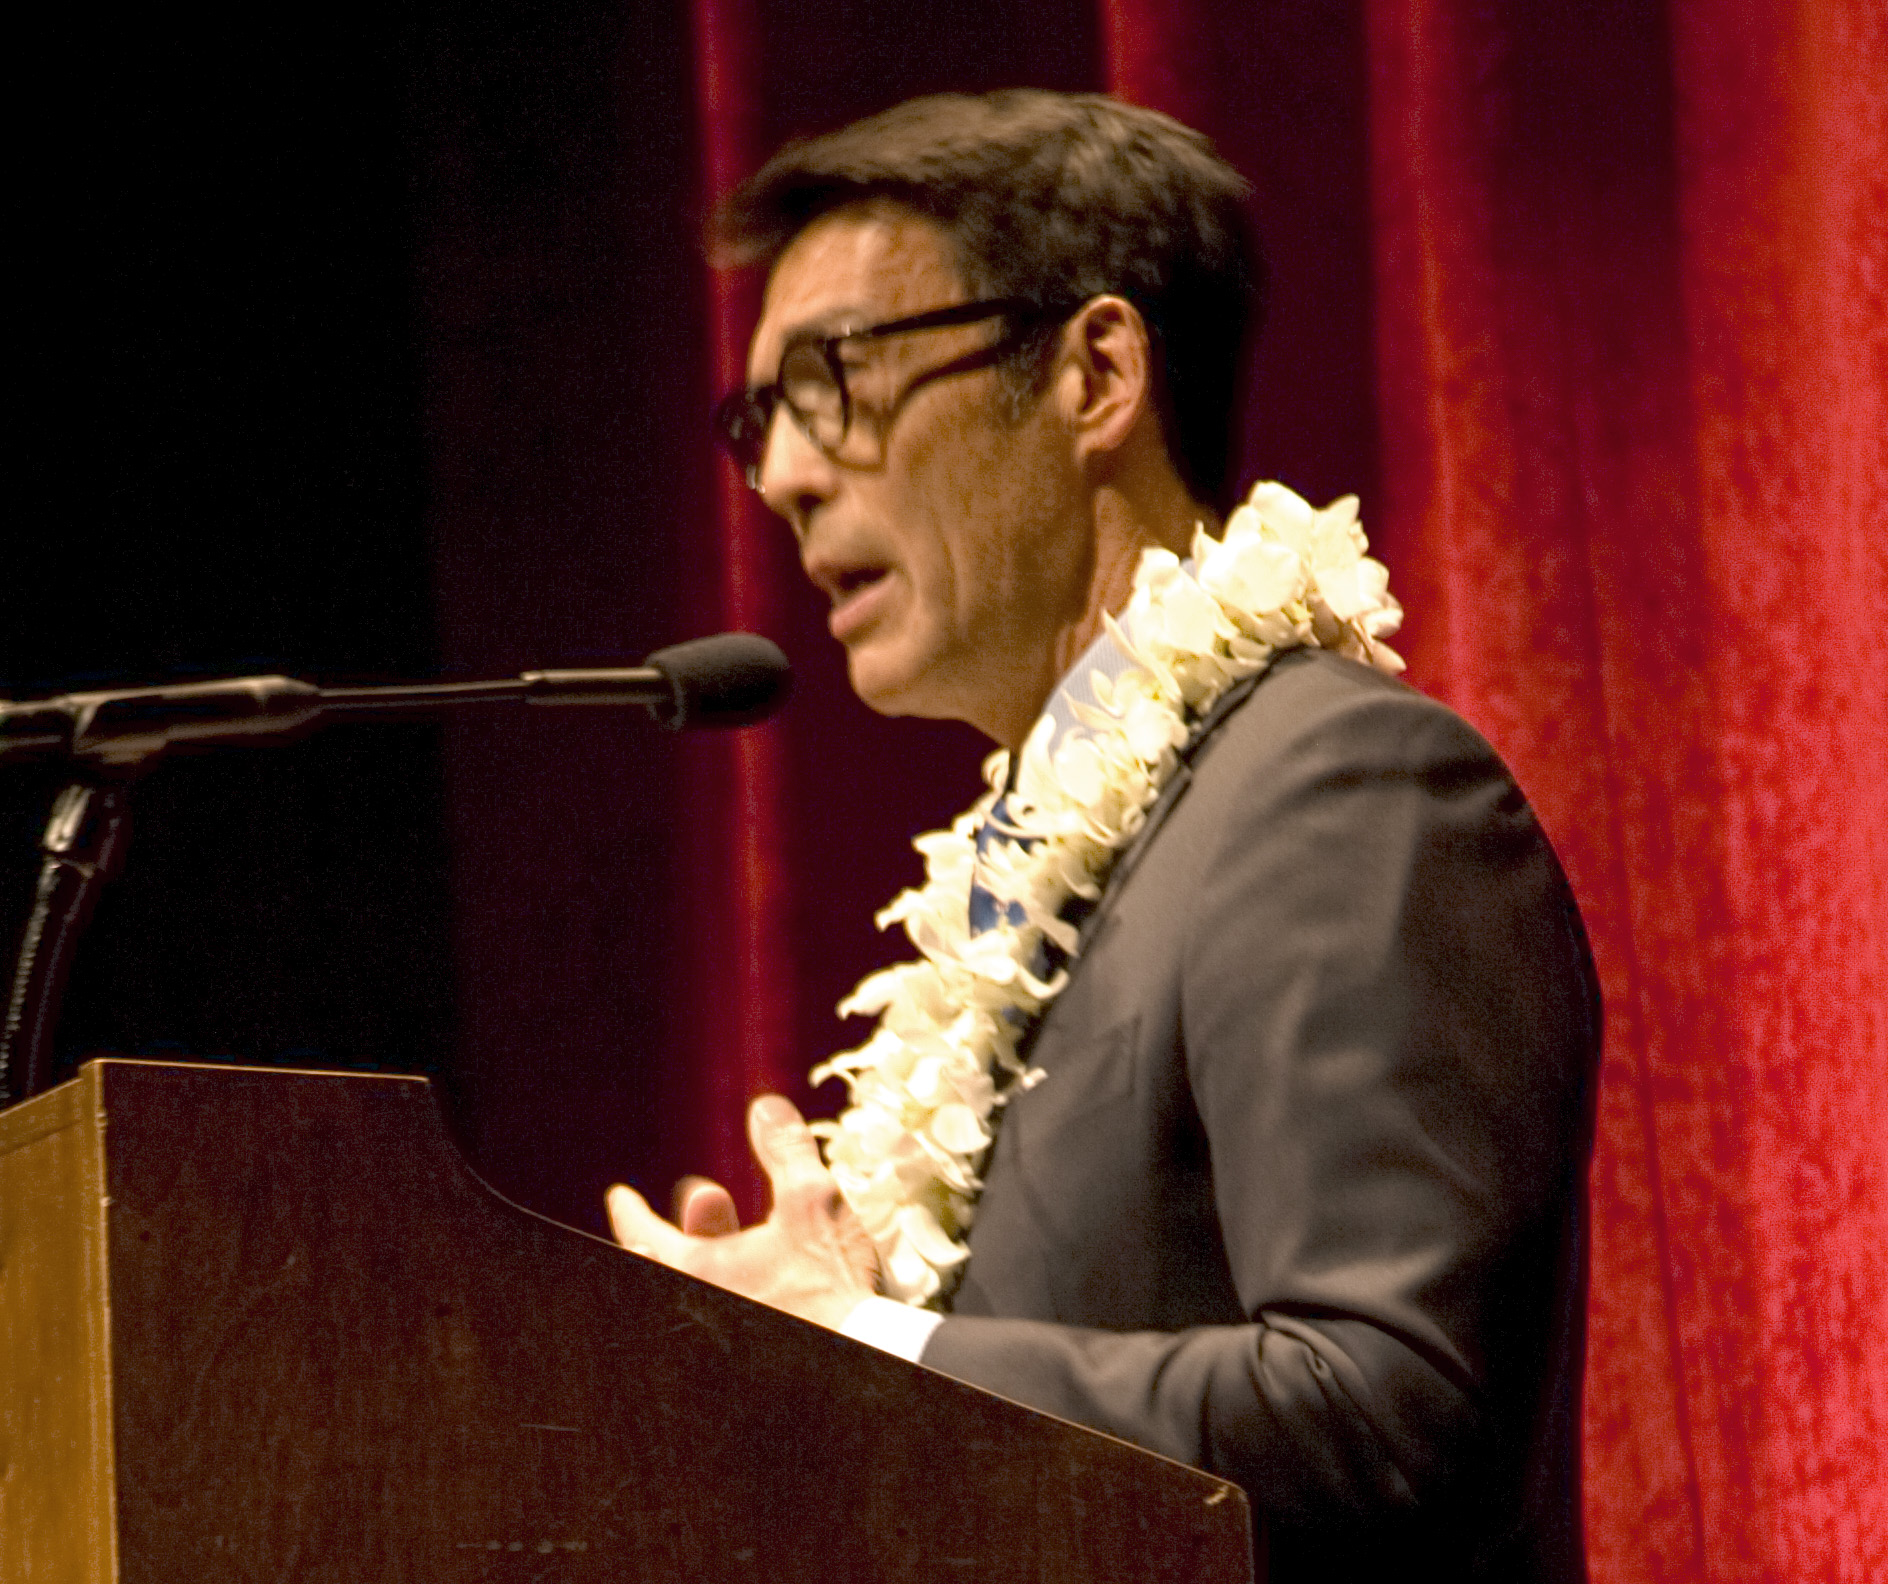 David Ono (ABC7 Los Angeles), Master of Ceremonies